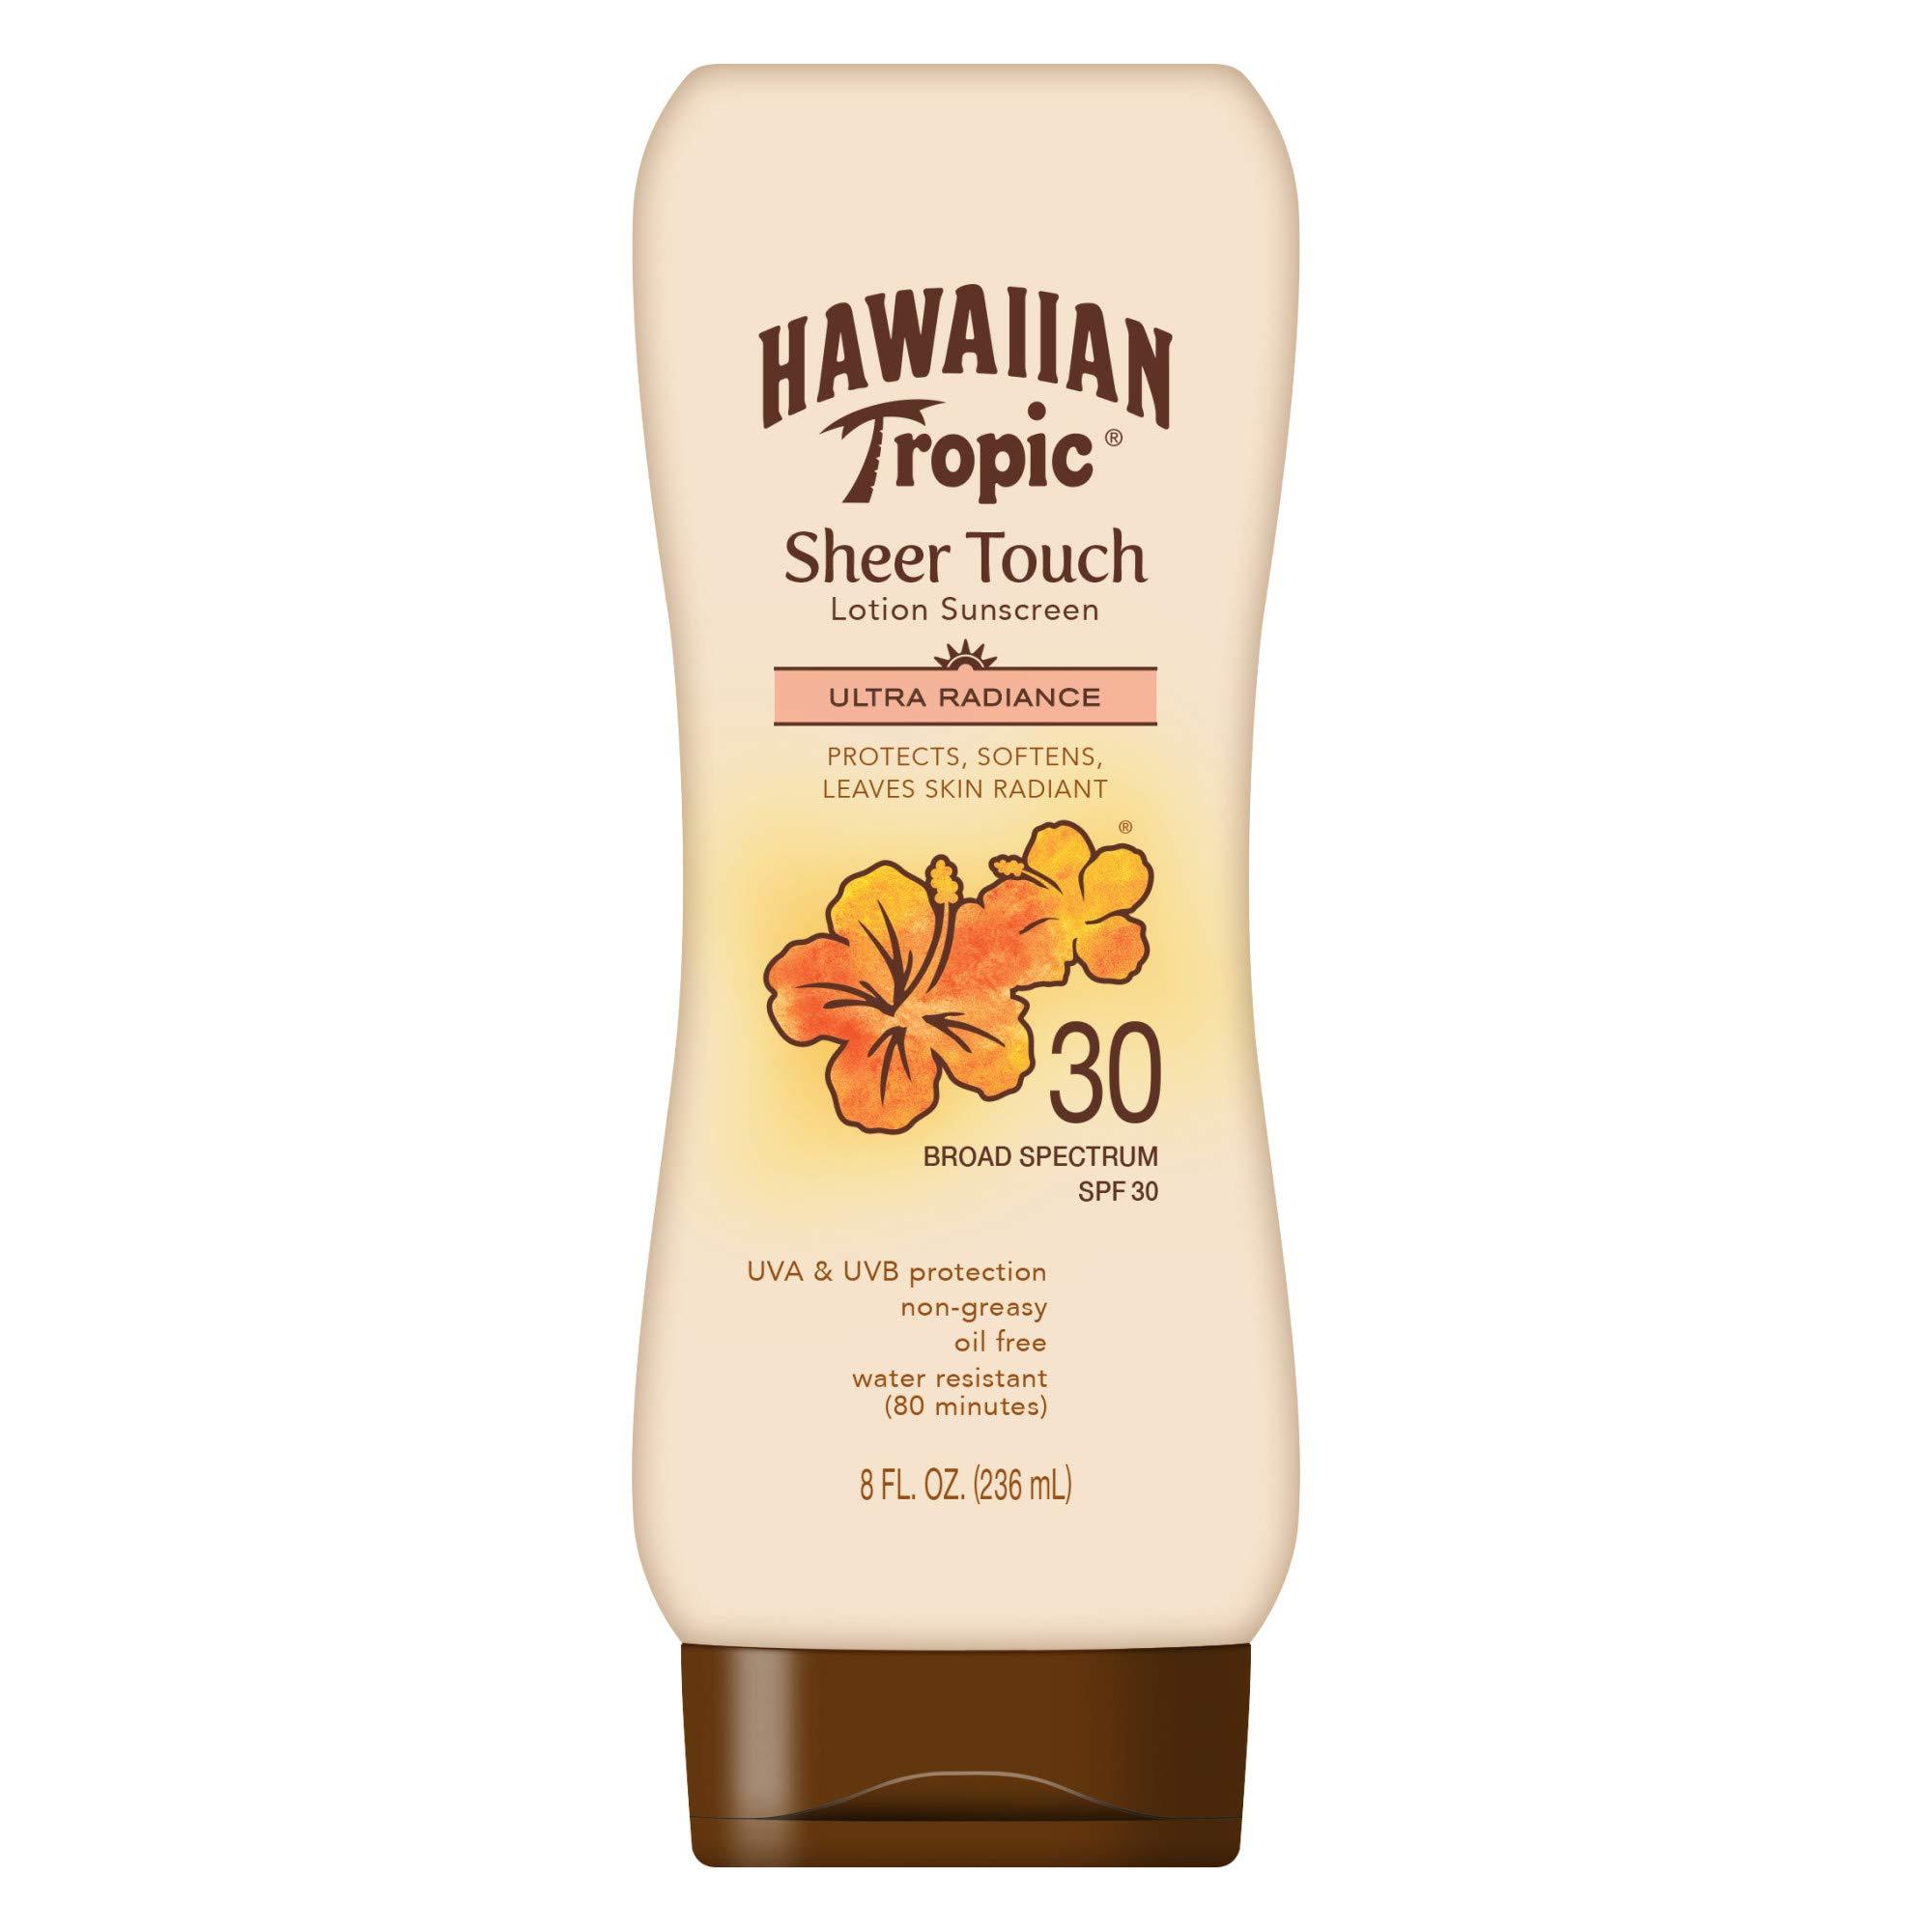 Hawaiian Tropic Lotion Sunscreen Radiance